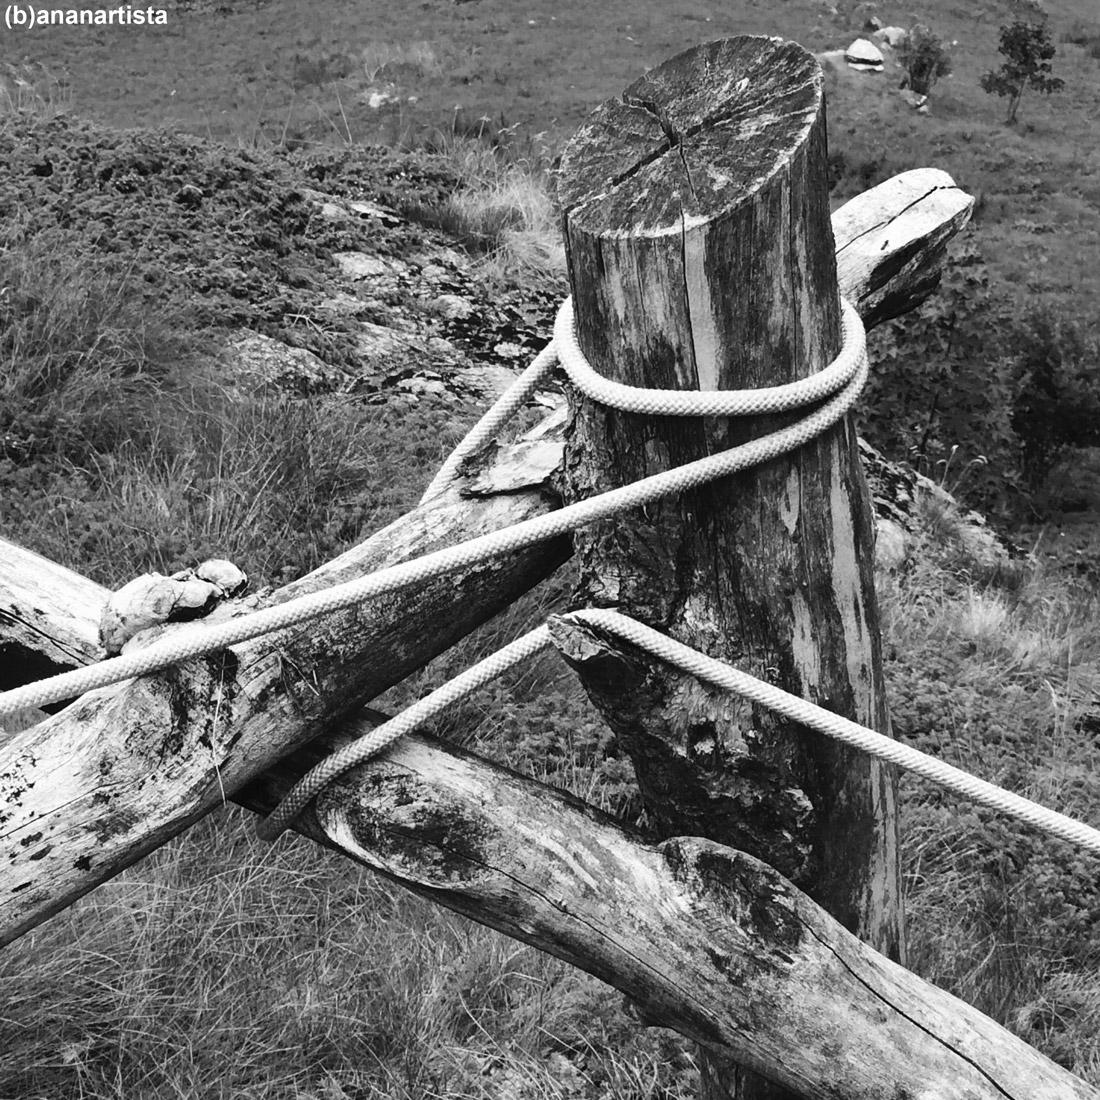 bondage: photography by (b)ananartista sbuff